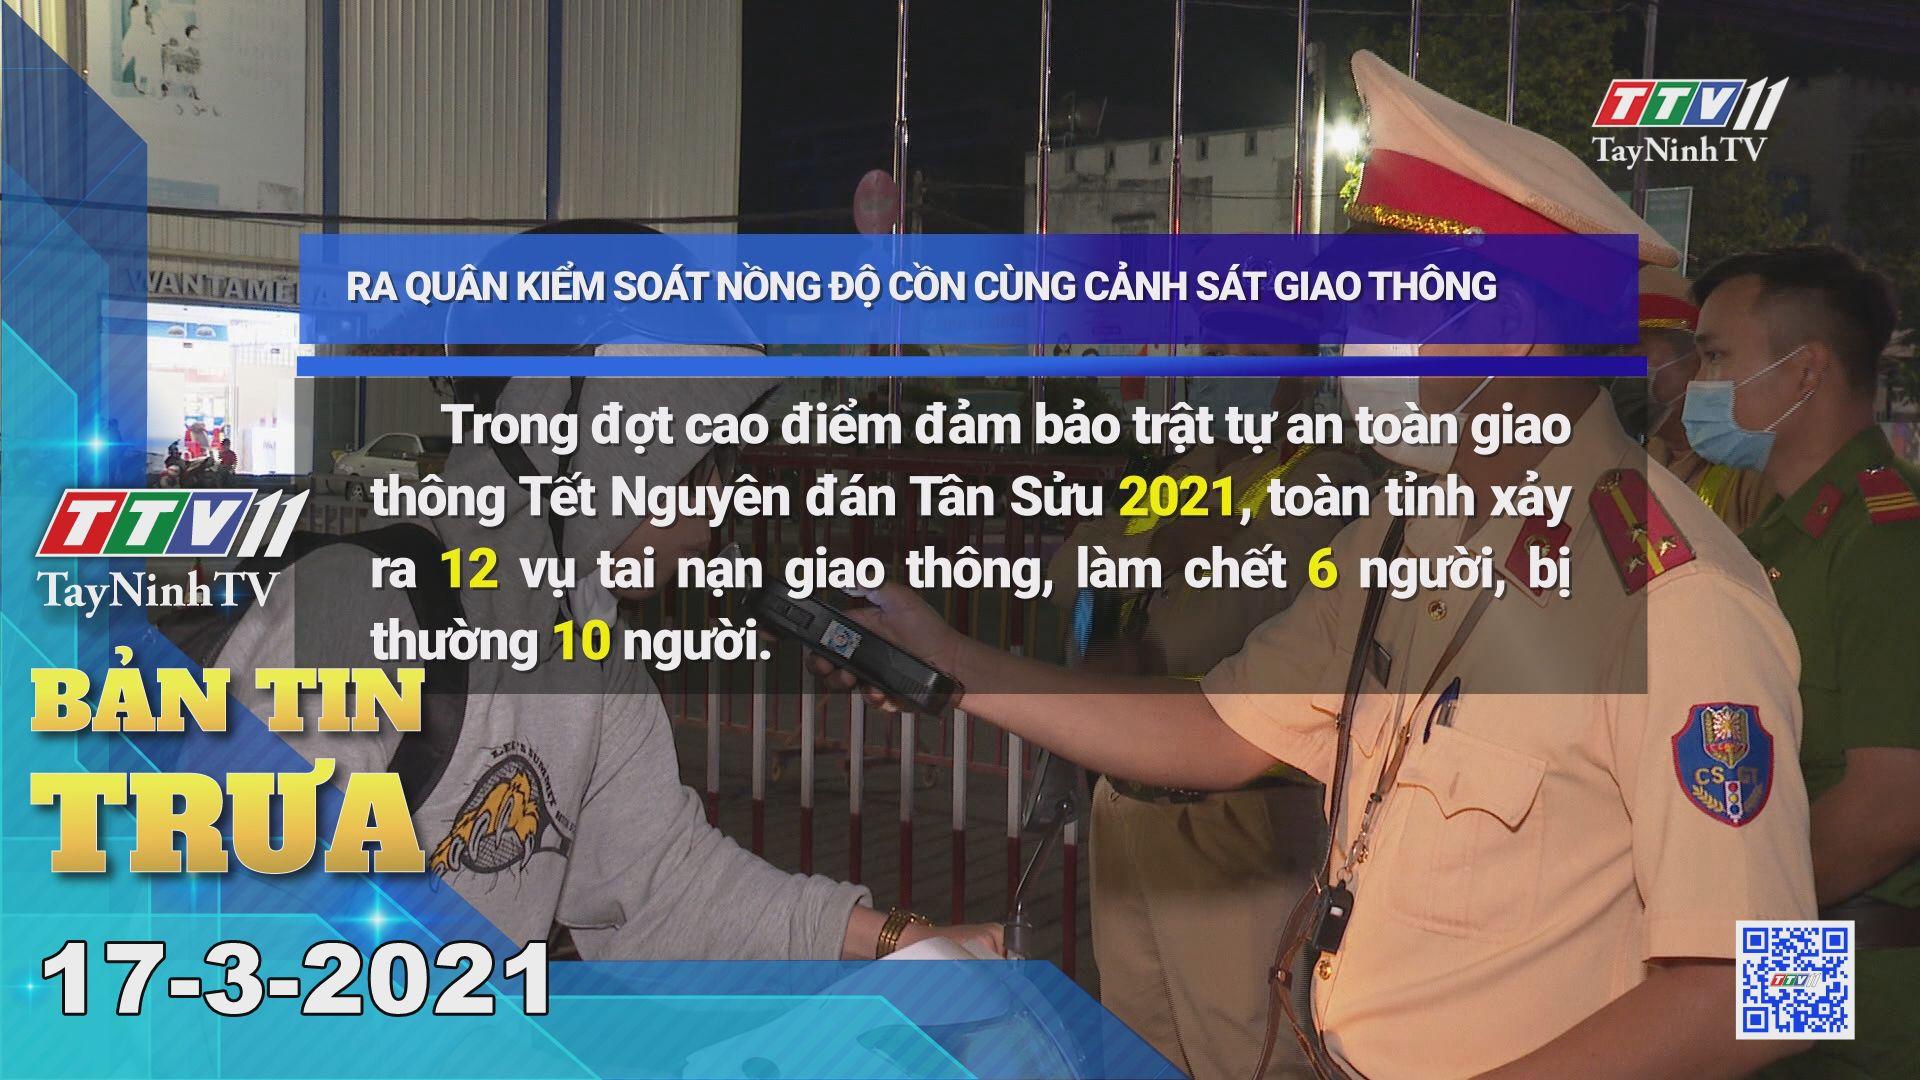 Bản tin trưa 17-3-2021 | Tin tức hôm nay | TayNinhTV